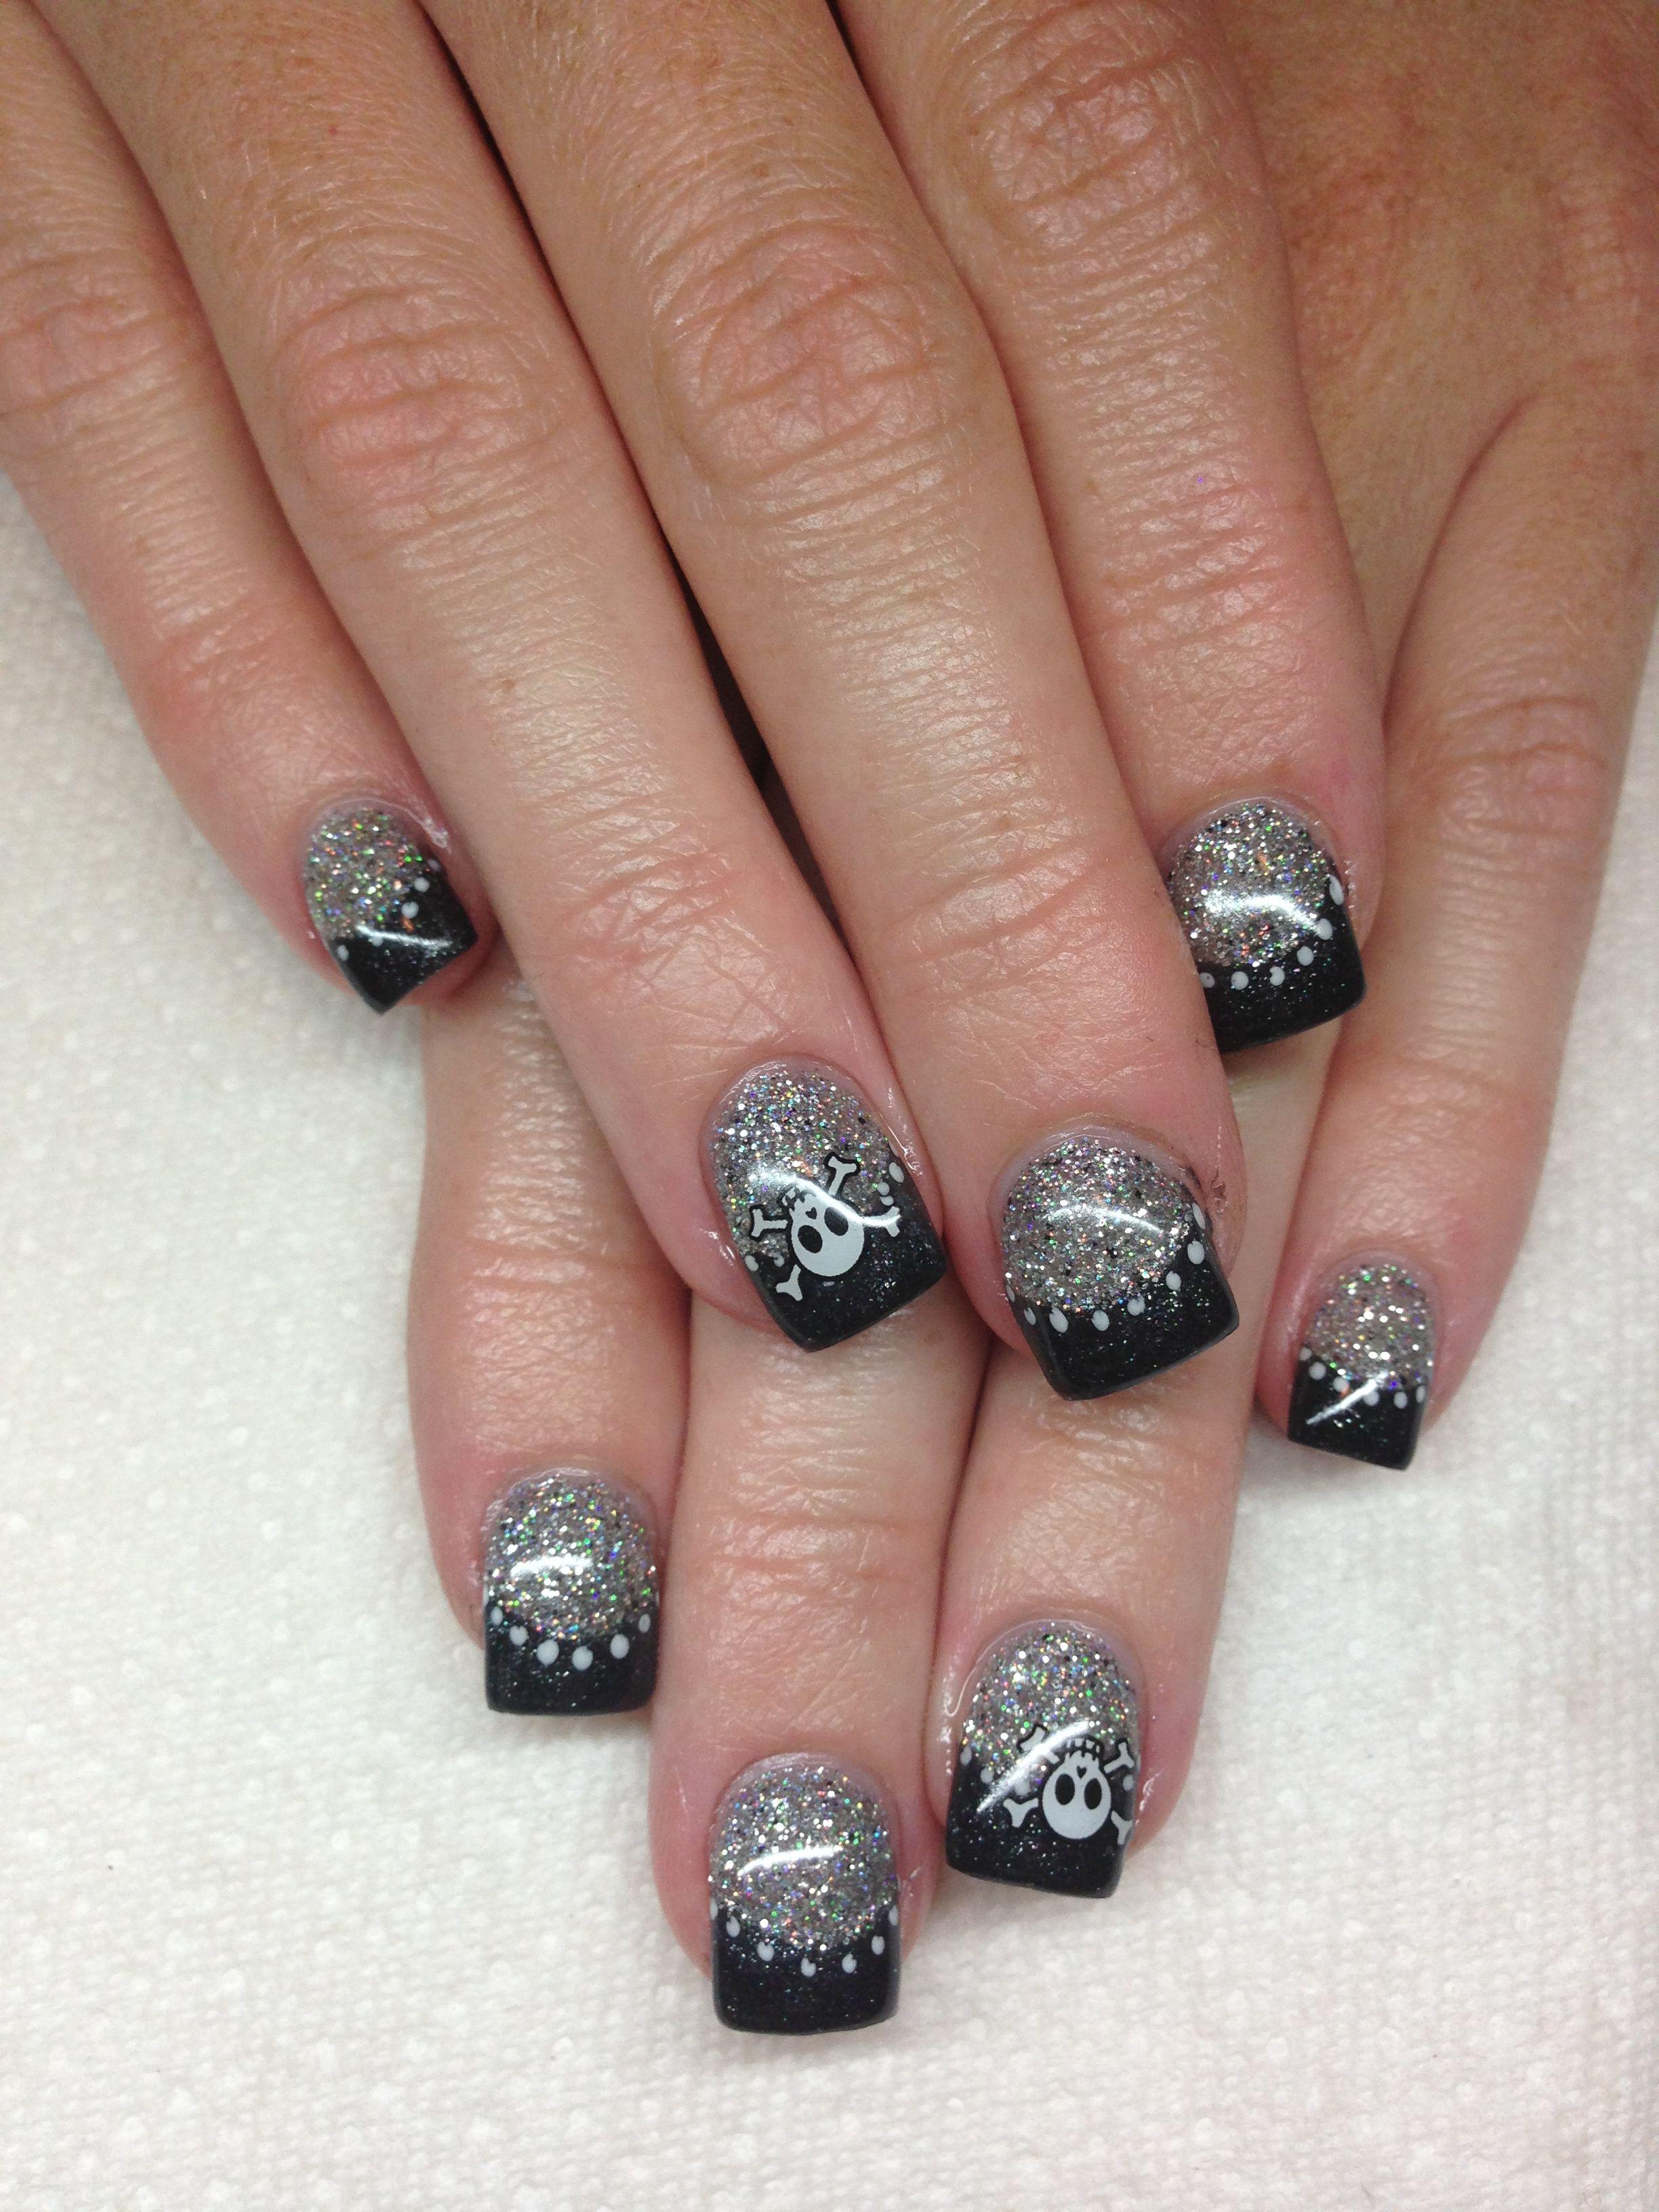 gel nails. silver glitter